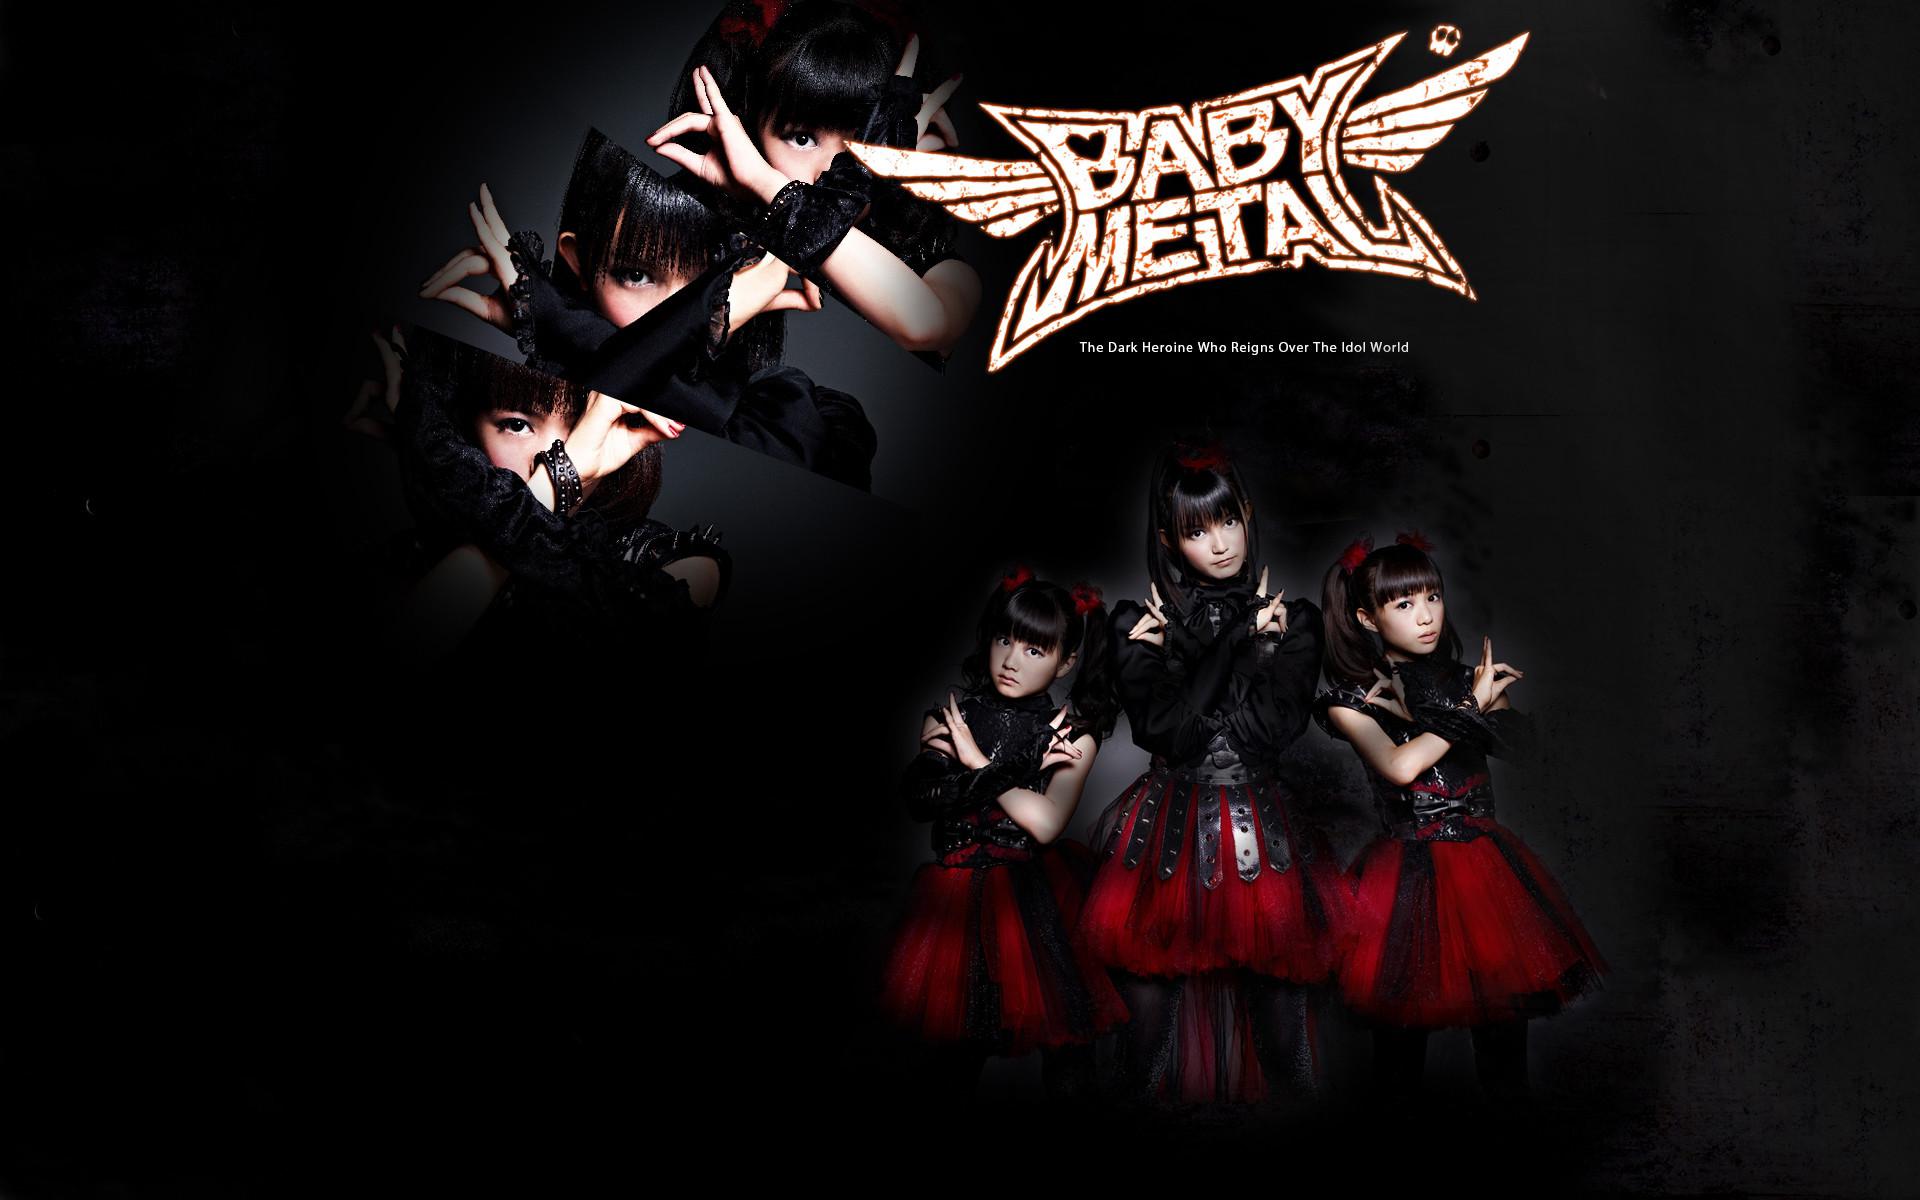 babymetal-red_and_black.  babymetal_wallpaper_i_d_z_version_1_by_kirito_zoldyck-d5urzch